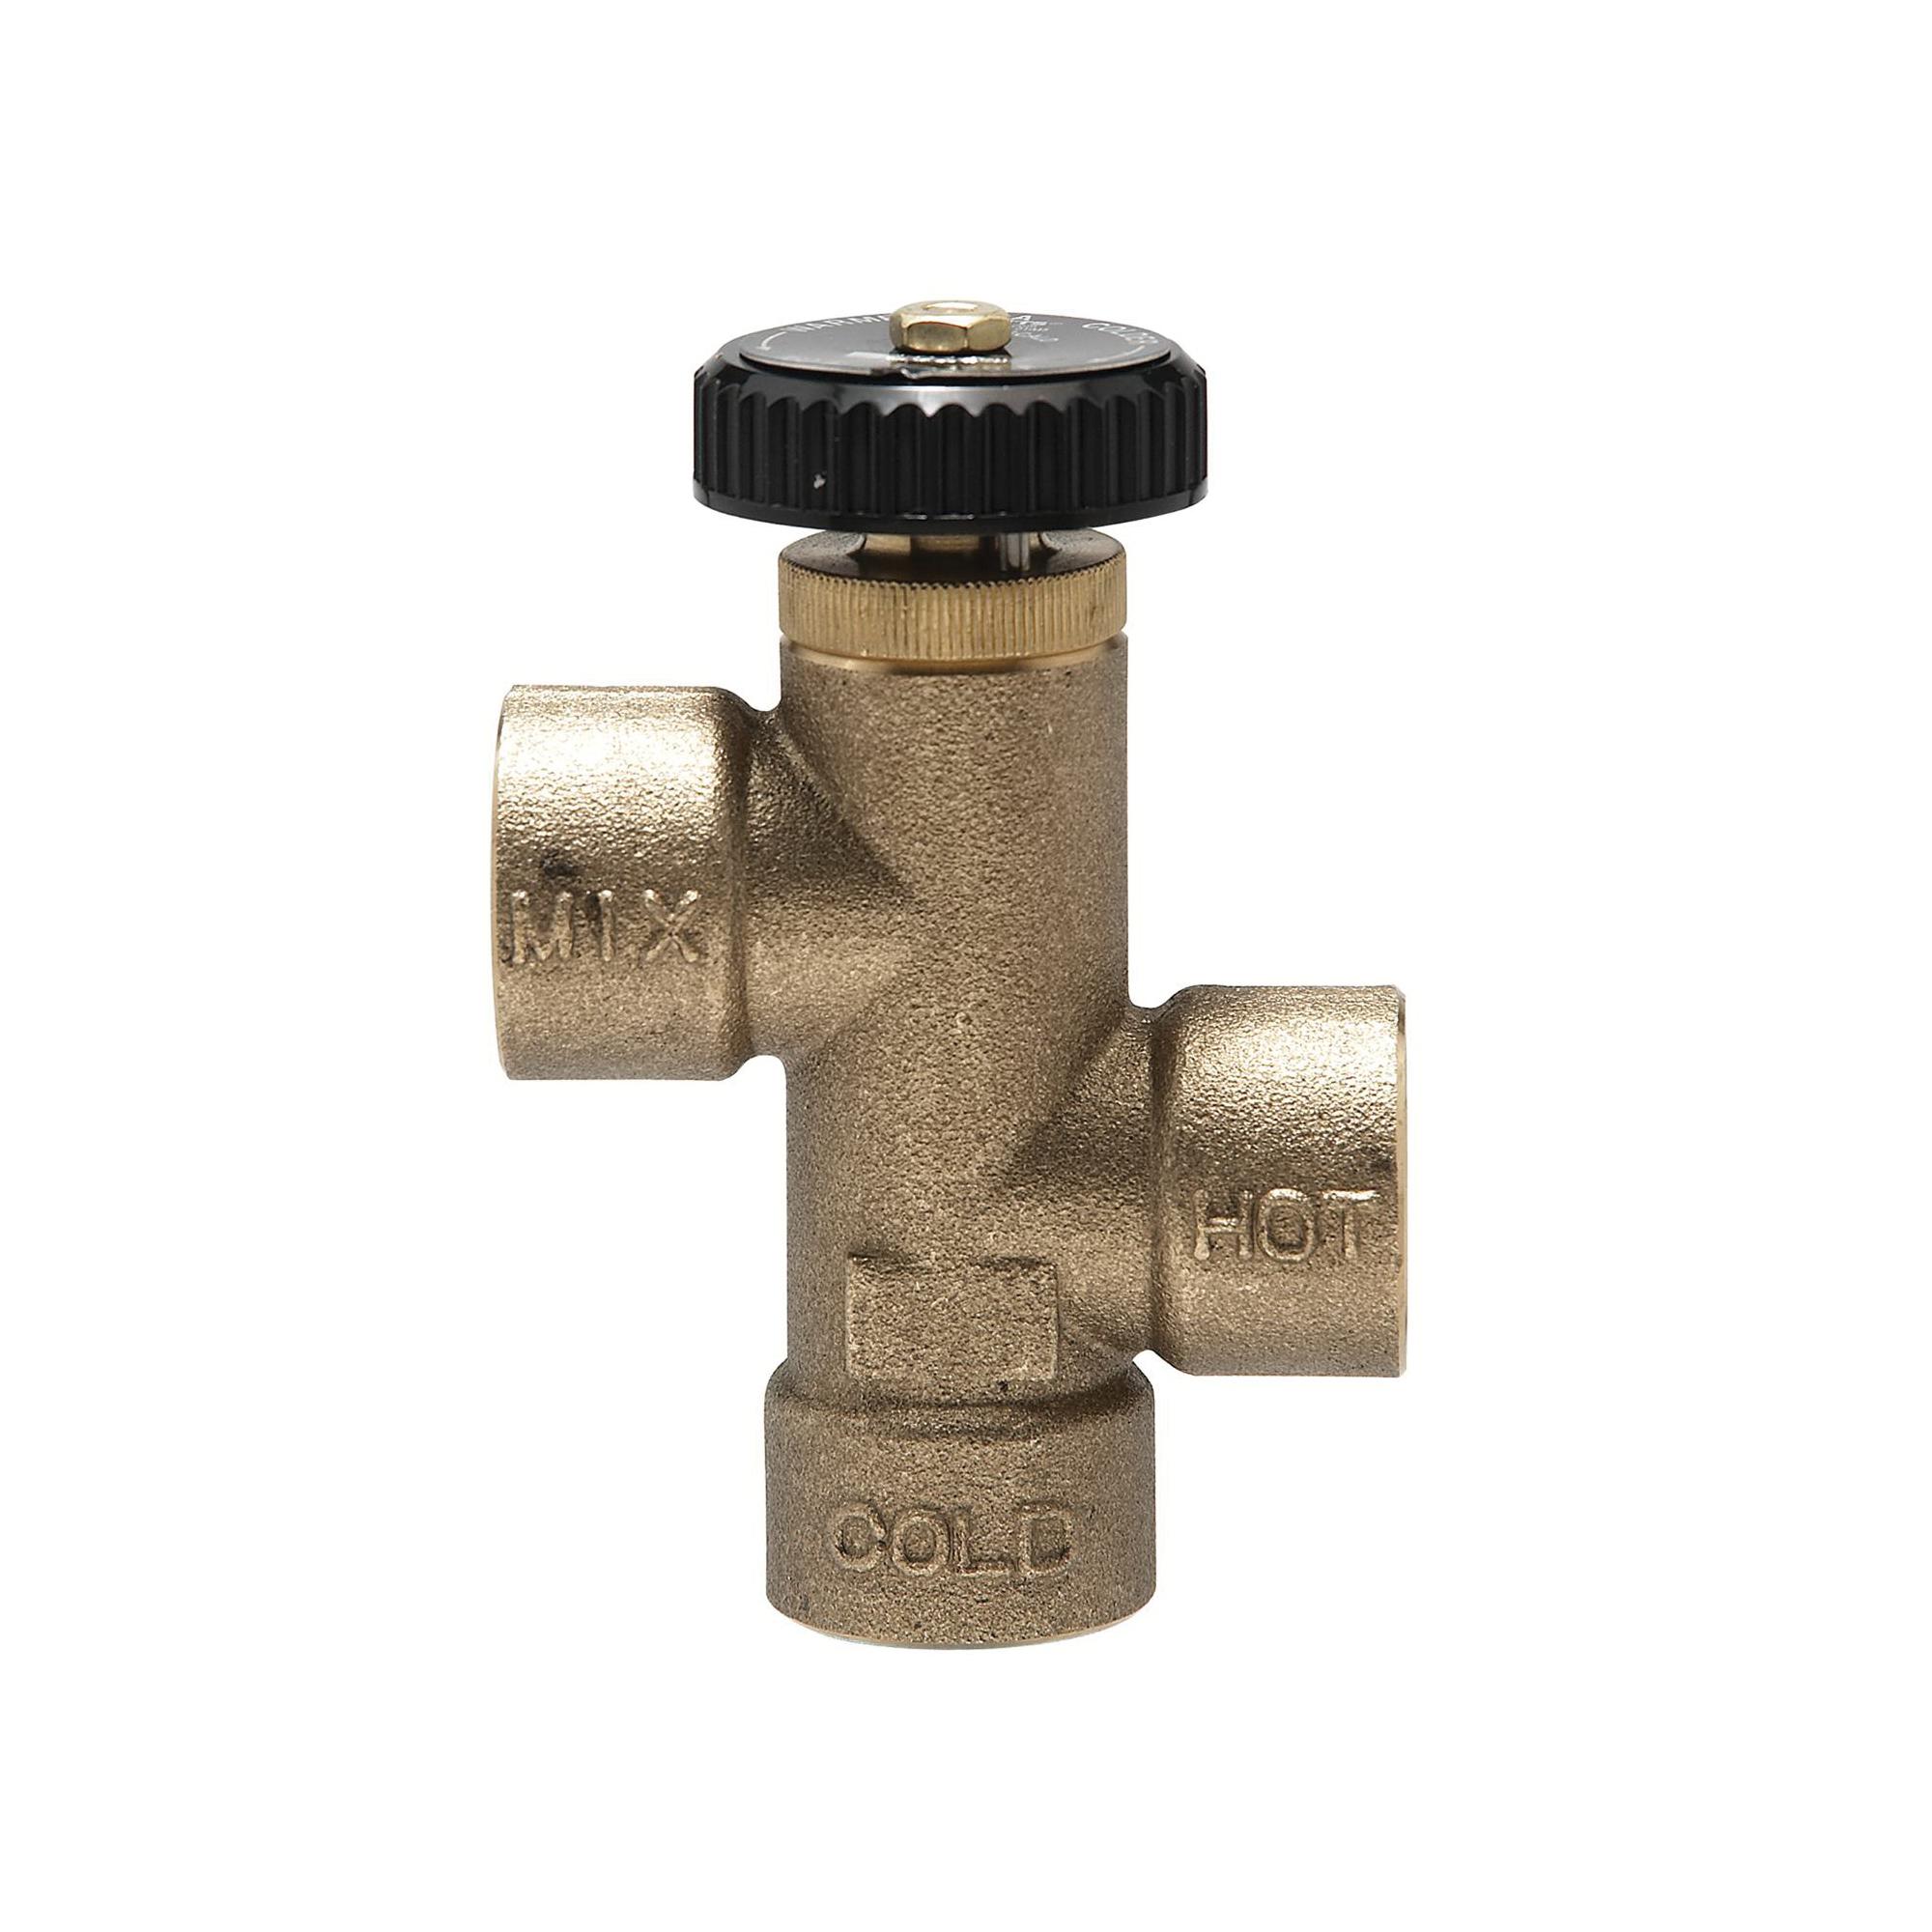 WATTS® 0559130 LF70A Extender Tempering Valve, 1/2 in, Thread, 150 psi, 2 gpm, Brass Body